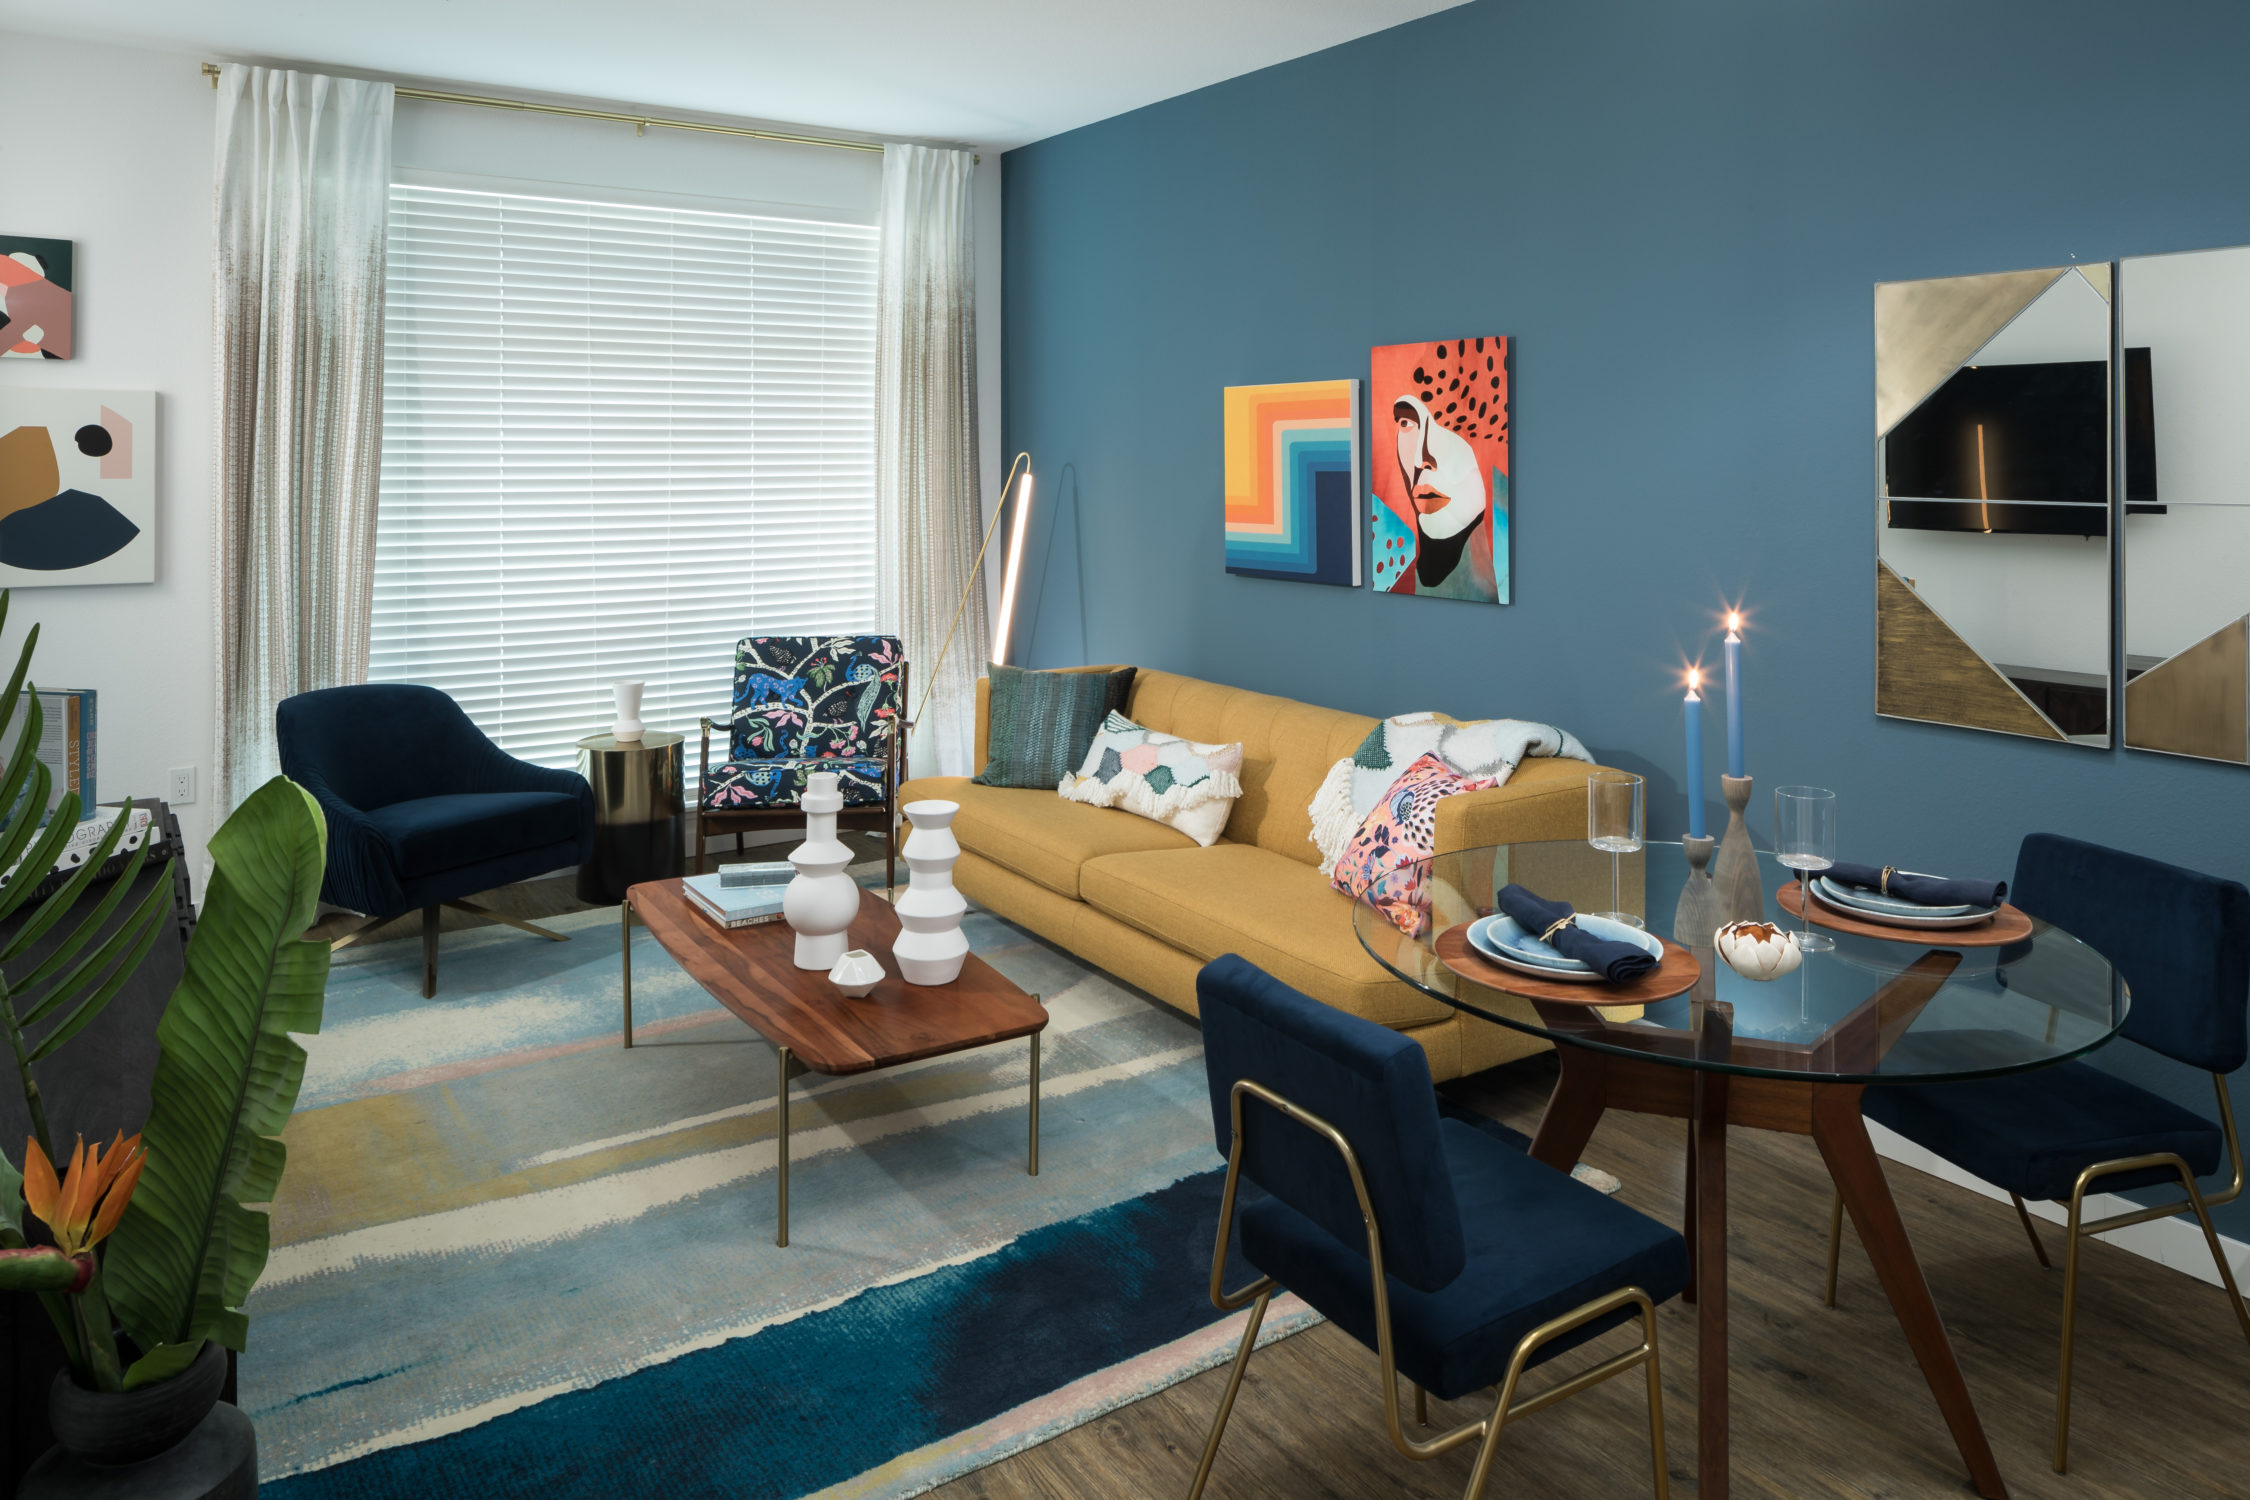 INT 01 Interior Living TCRA 4193 498